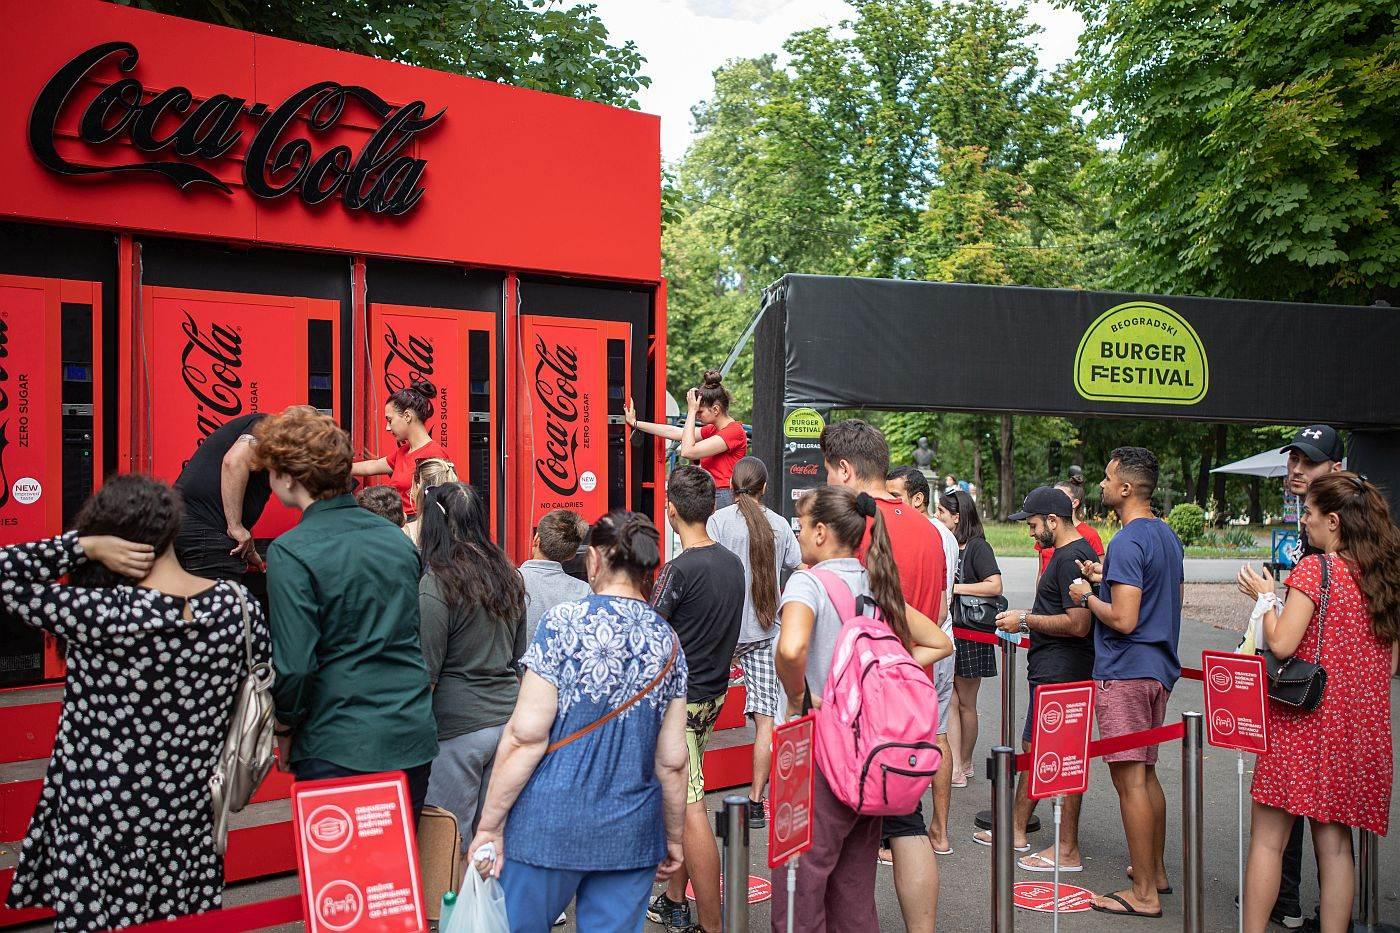 Burger Fest Coca-cola